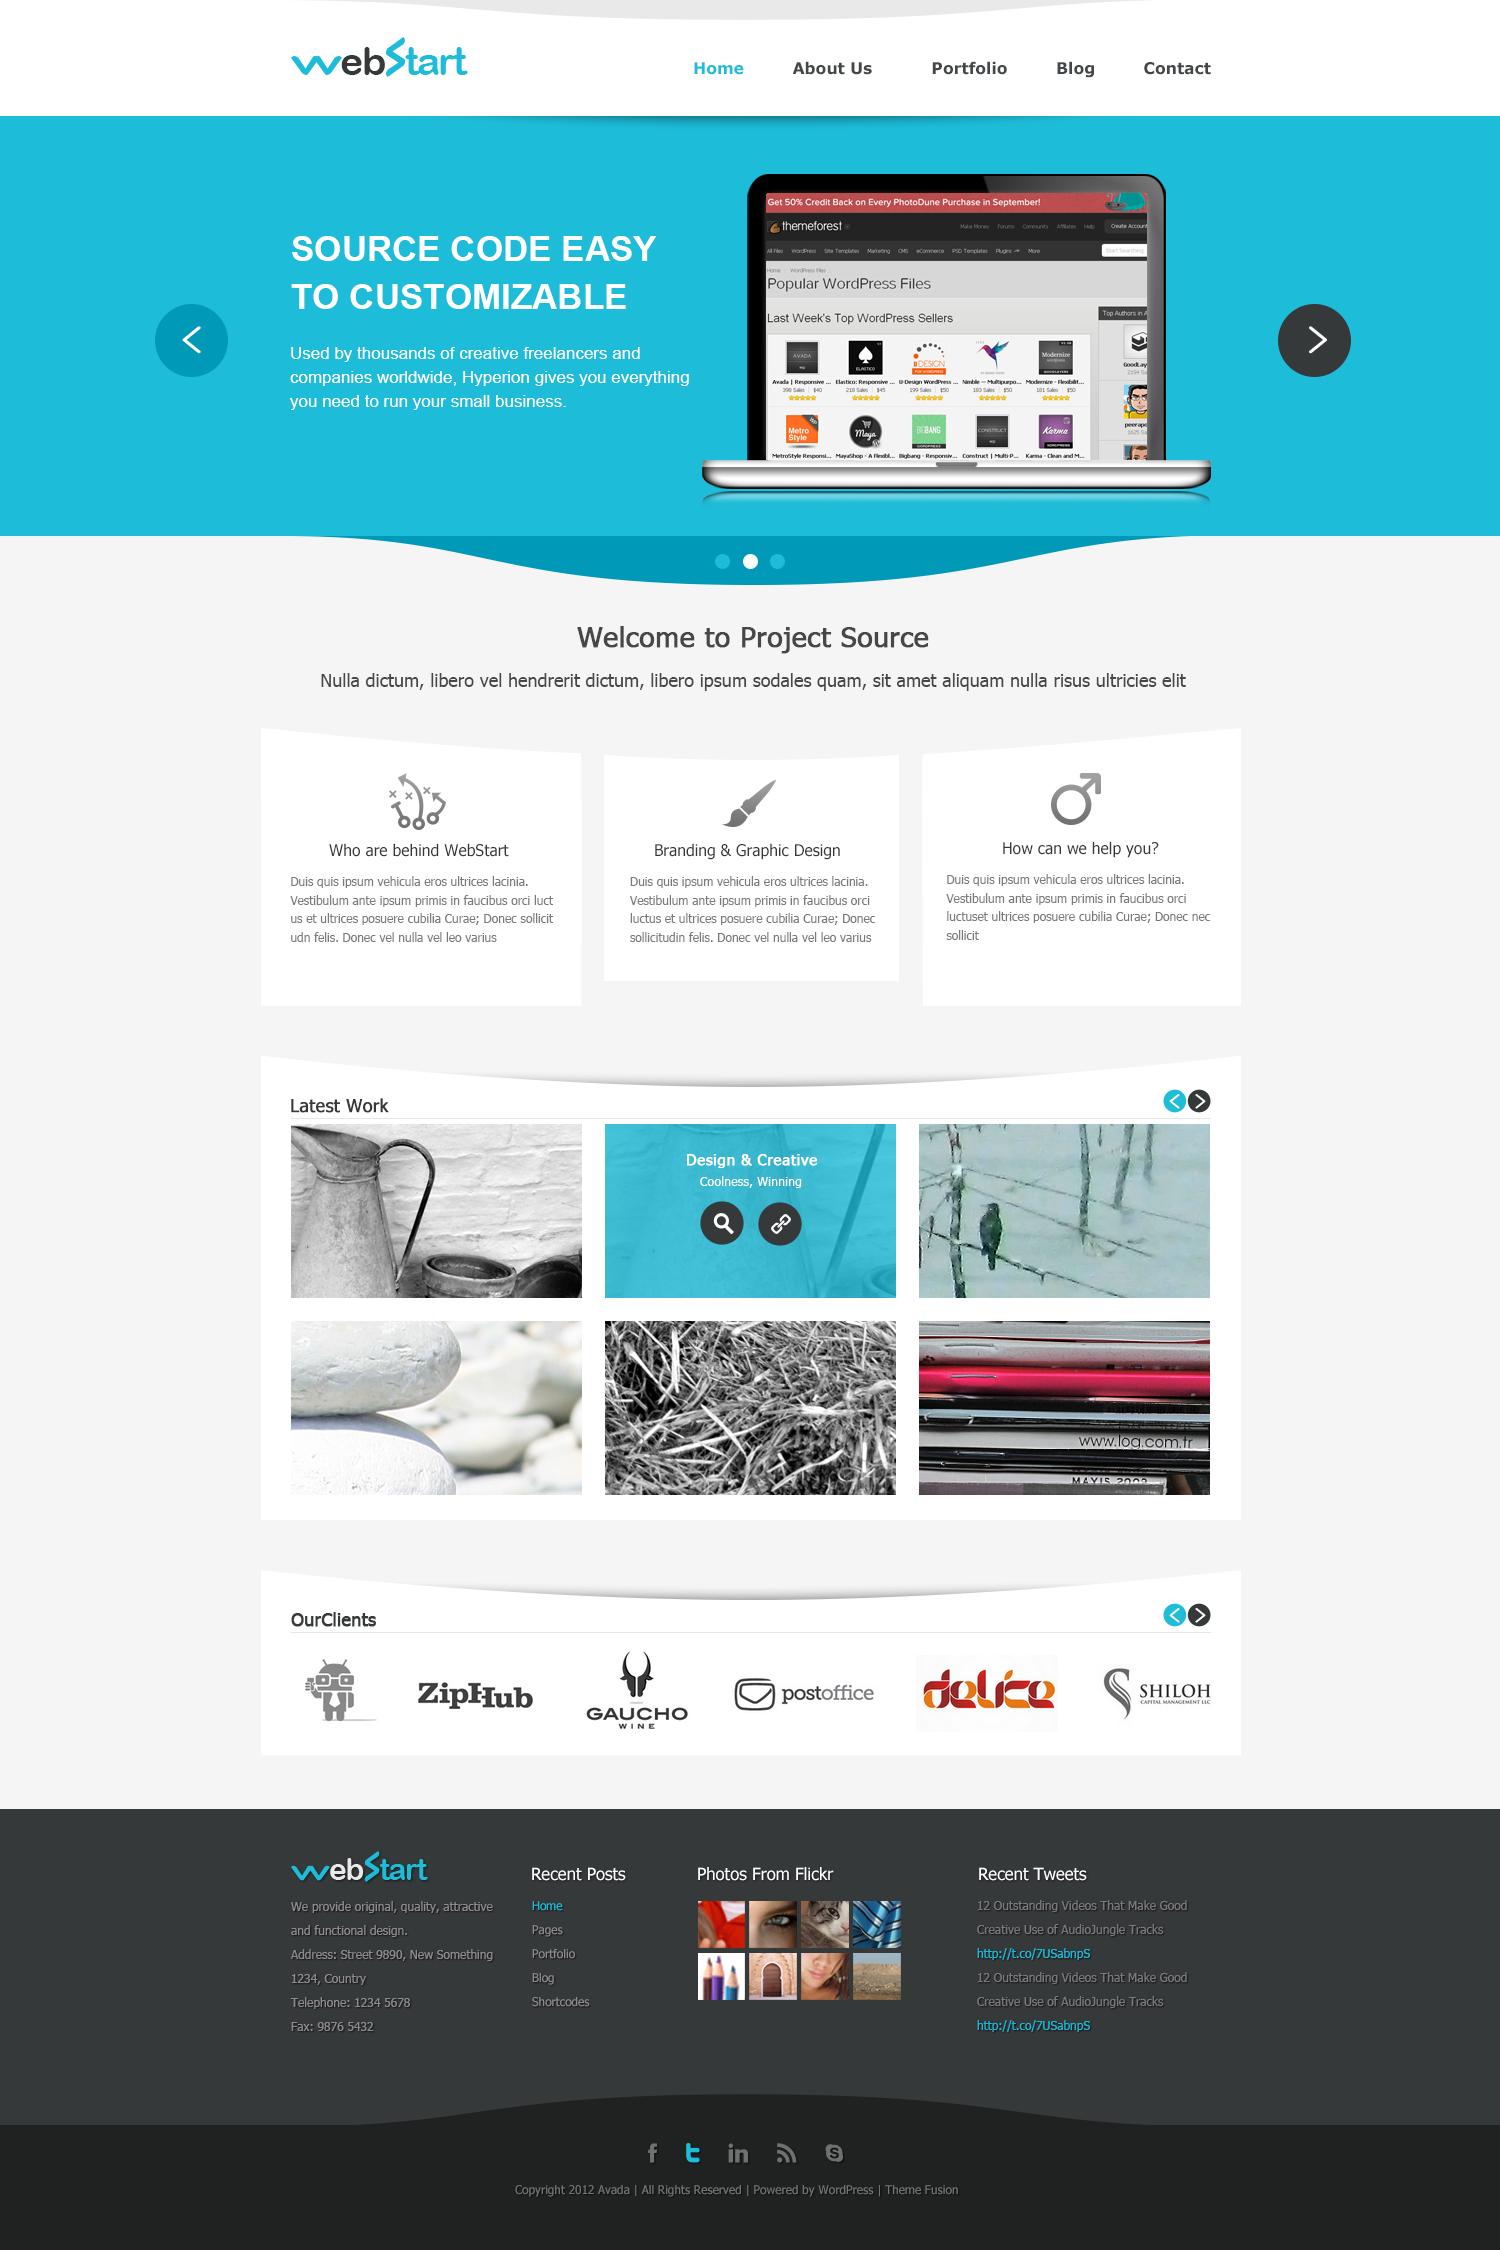 Webstart Psd Template Webstart Psd Template Web Design Programs Web Design Software Corporate Web Design